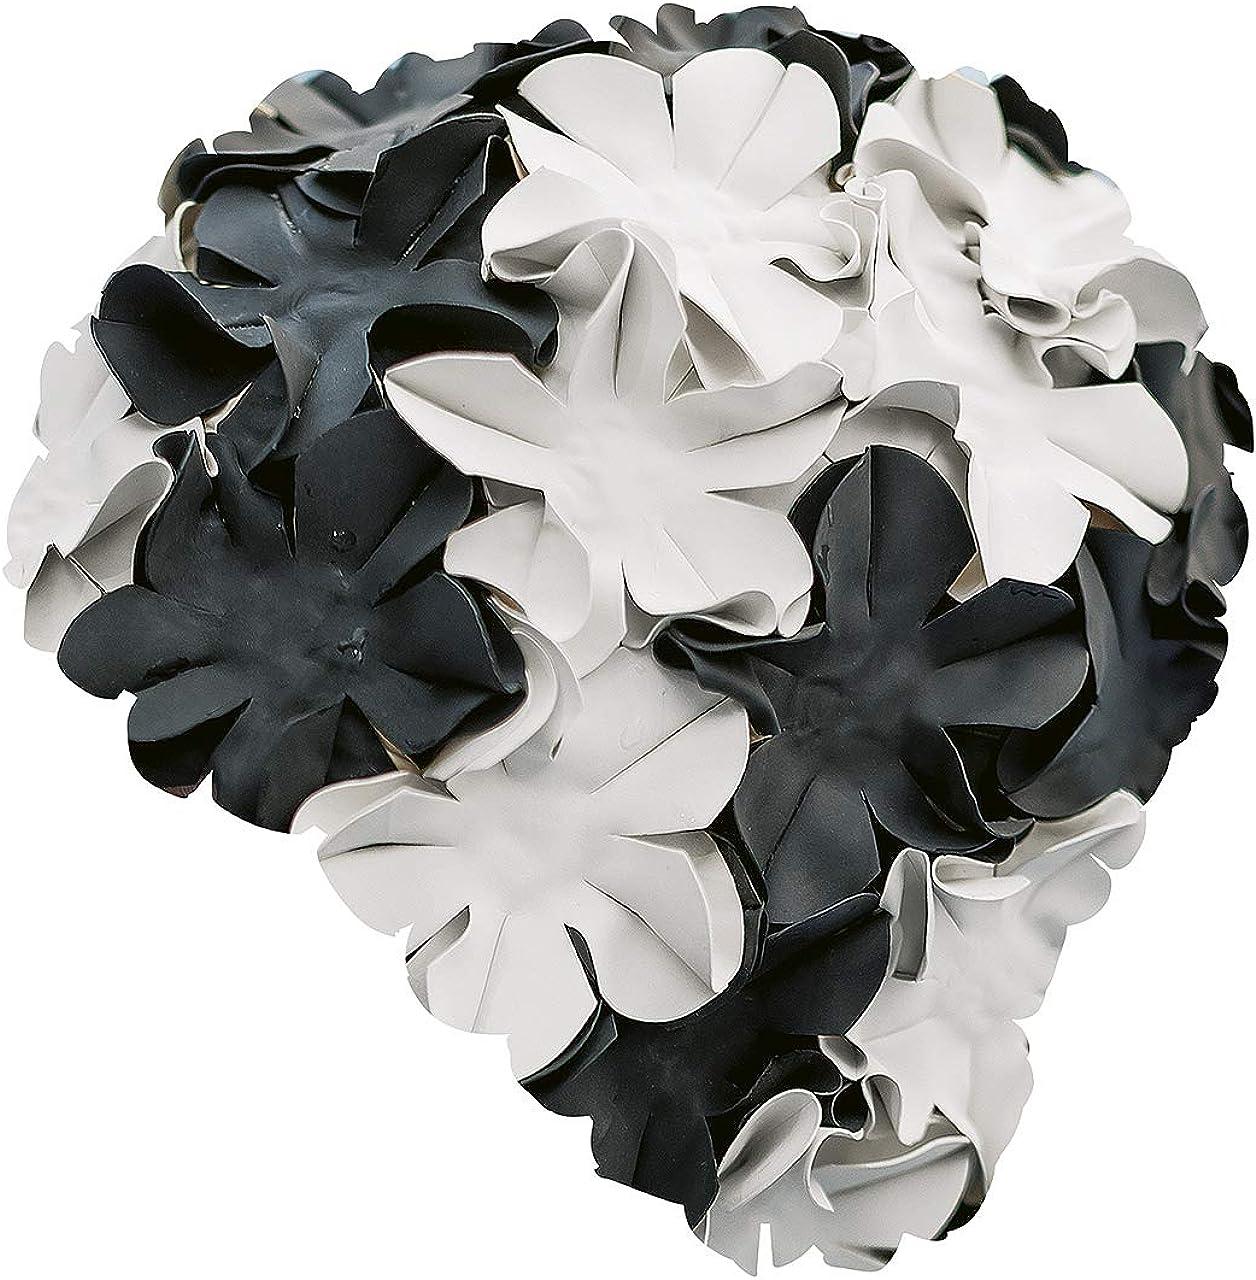 Fashy Negro - Gorro de baño de natación, Color Negro/Blanco